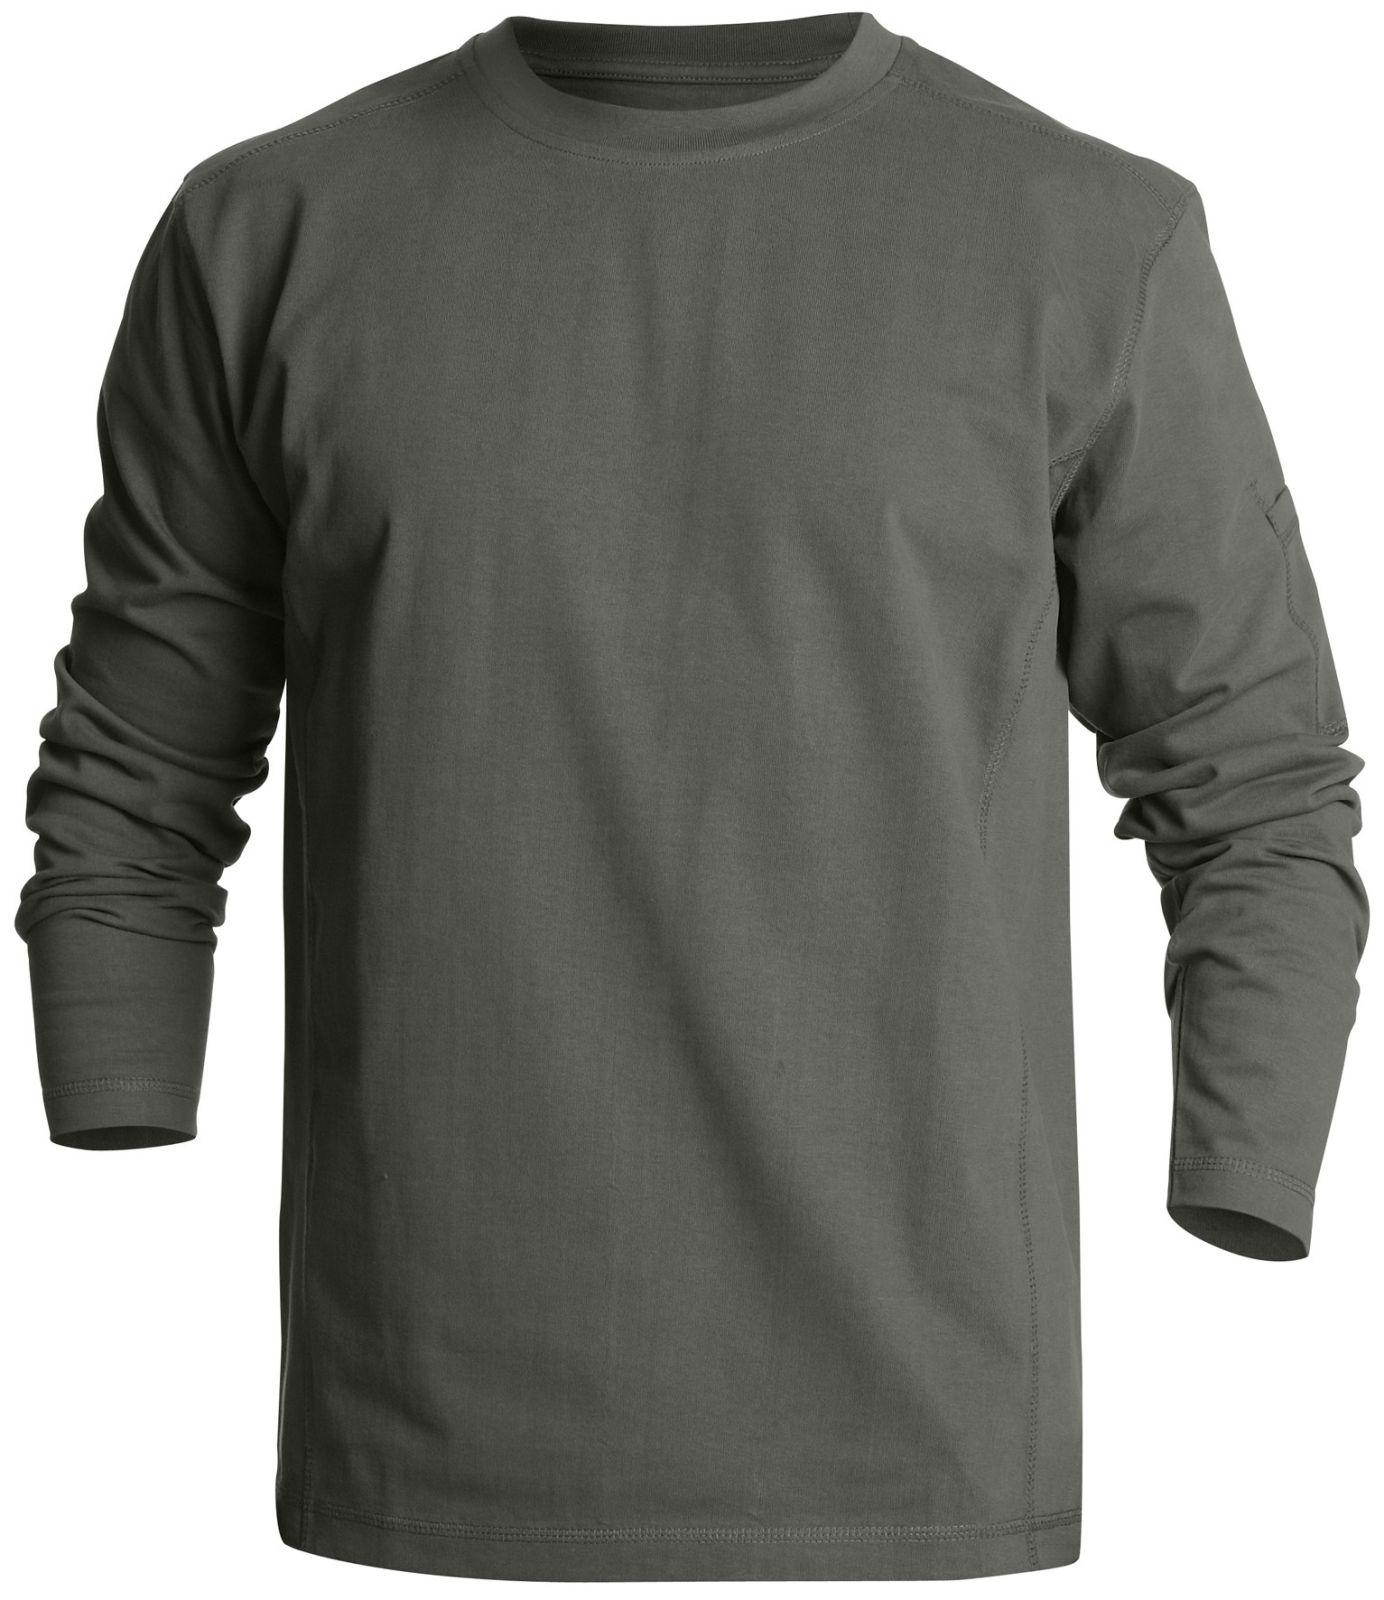 Blaklader T-shirts 33391034 army groen(4600)